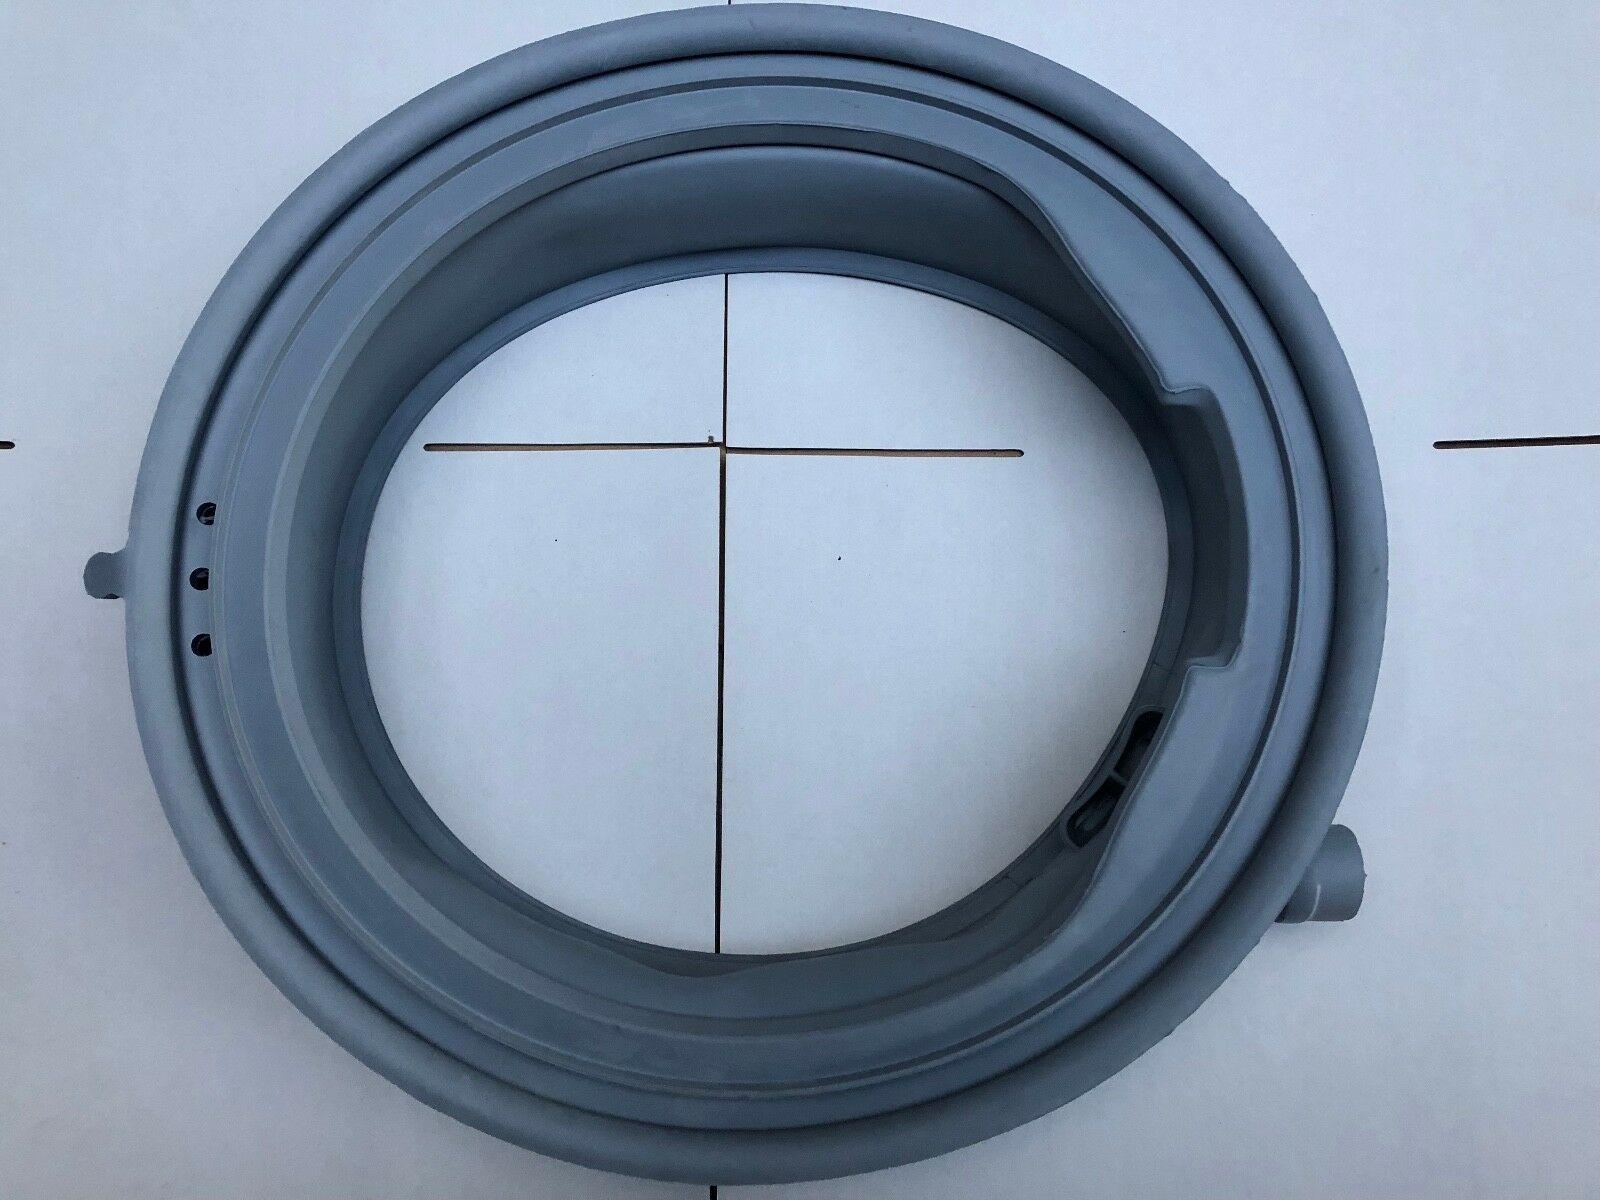 Bosch Avantixx Washing Machine Door Boot Seal Gasket WAP24261AU/01 WAP24261AU/02